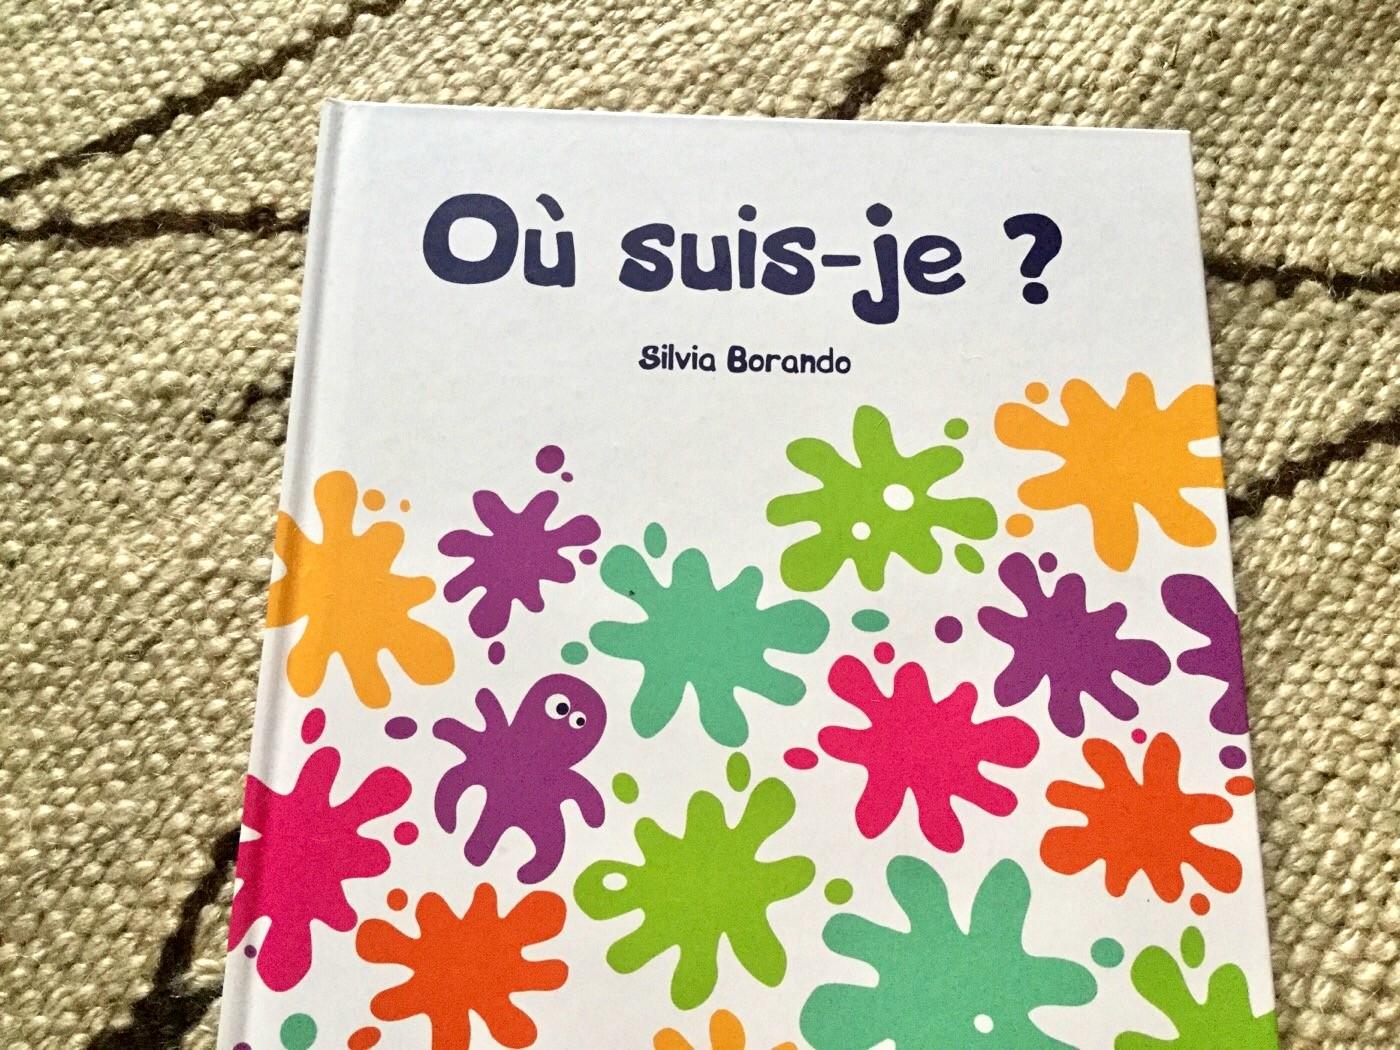 NASCONDINO / OÙ SOUIS-JE? Silvia Borando ~ Aliberti Kids / Circonflexe ~ 2010 / 2015